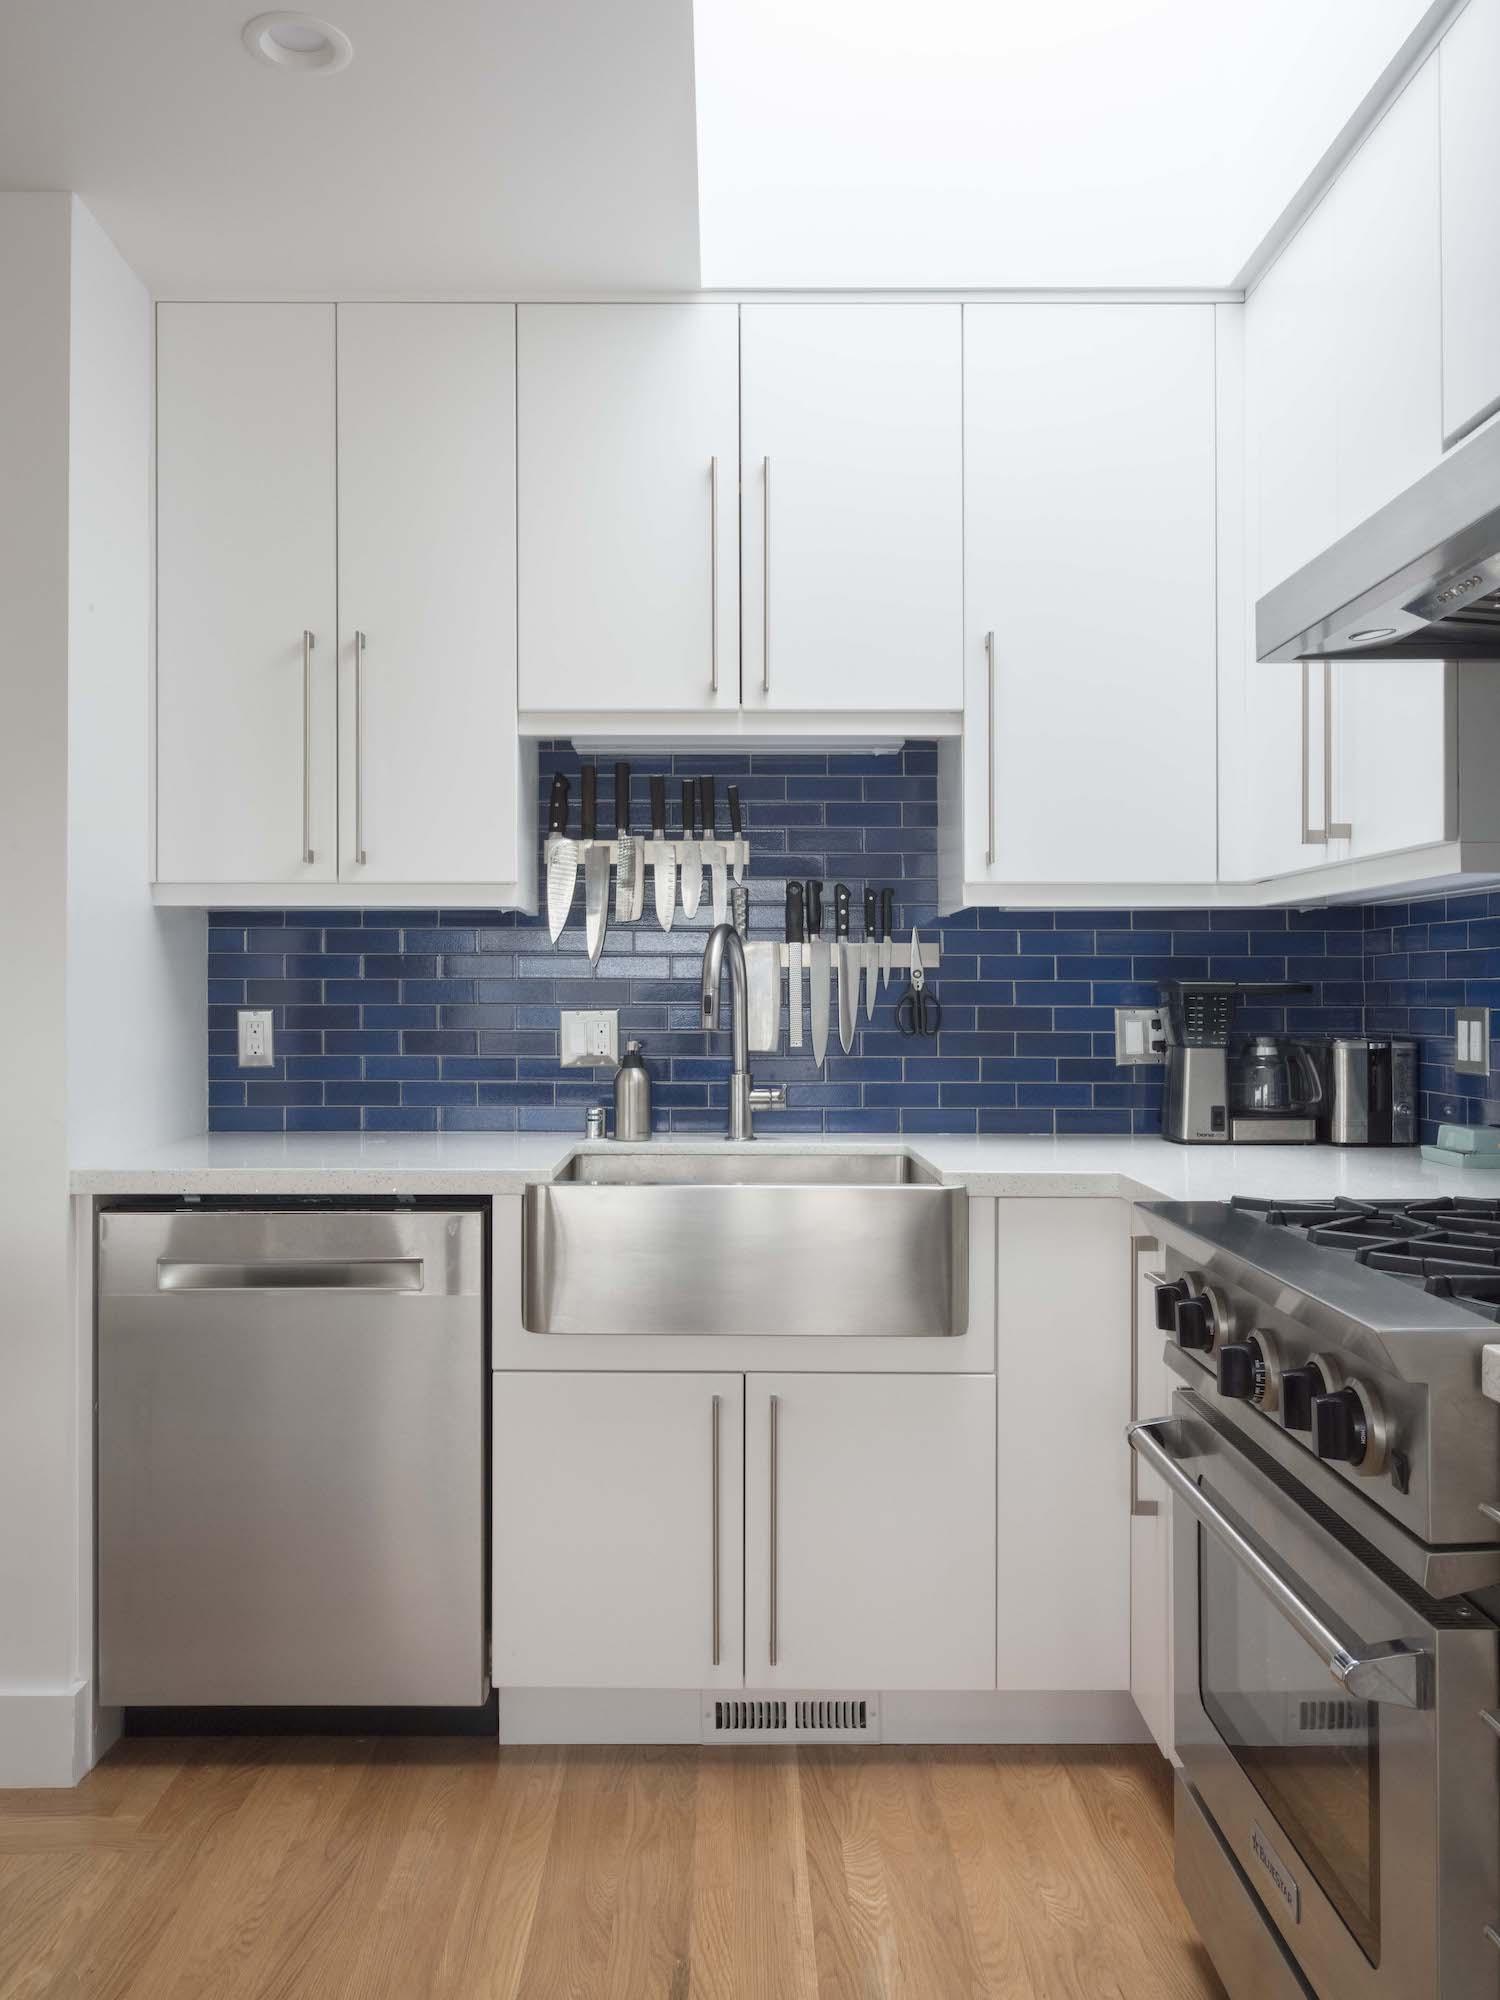 - Elsie Street Remodel Client Testimonial — San Francisco Design Build